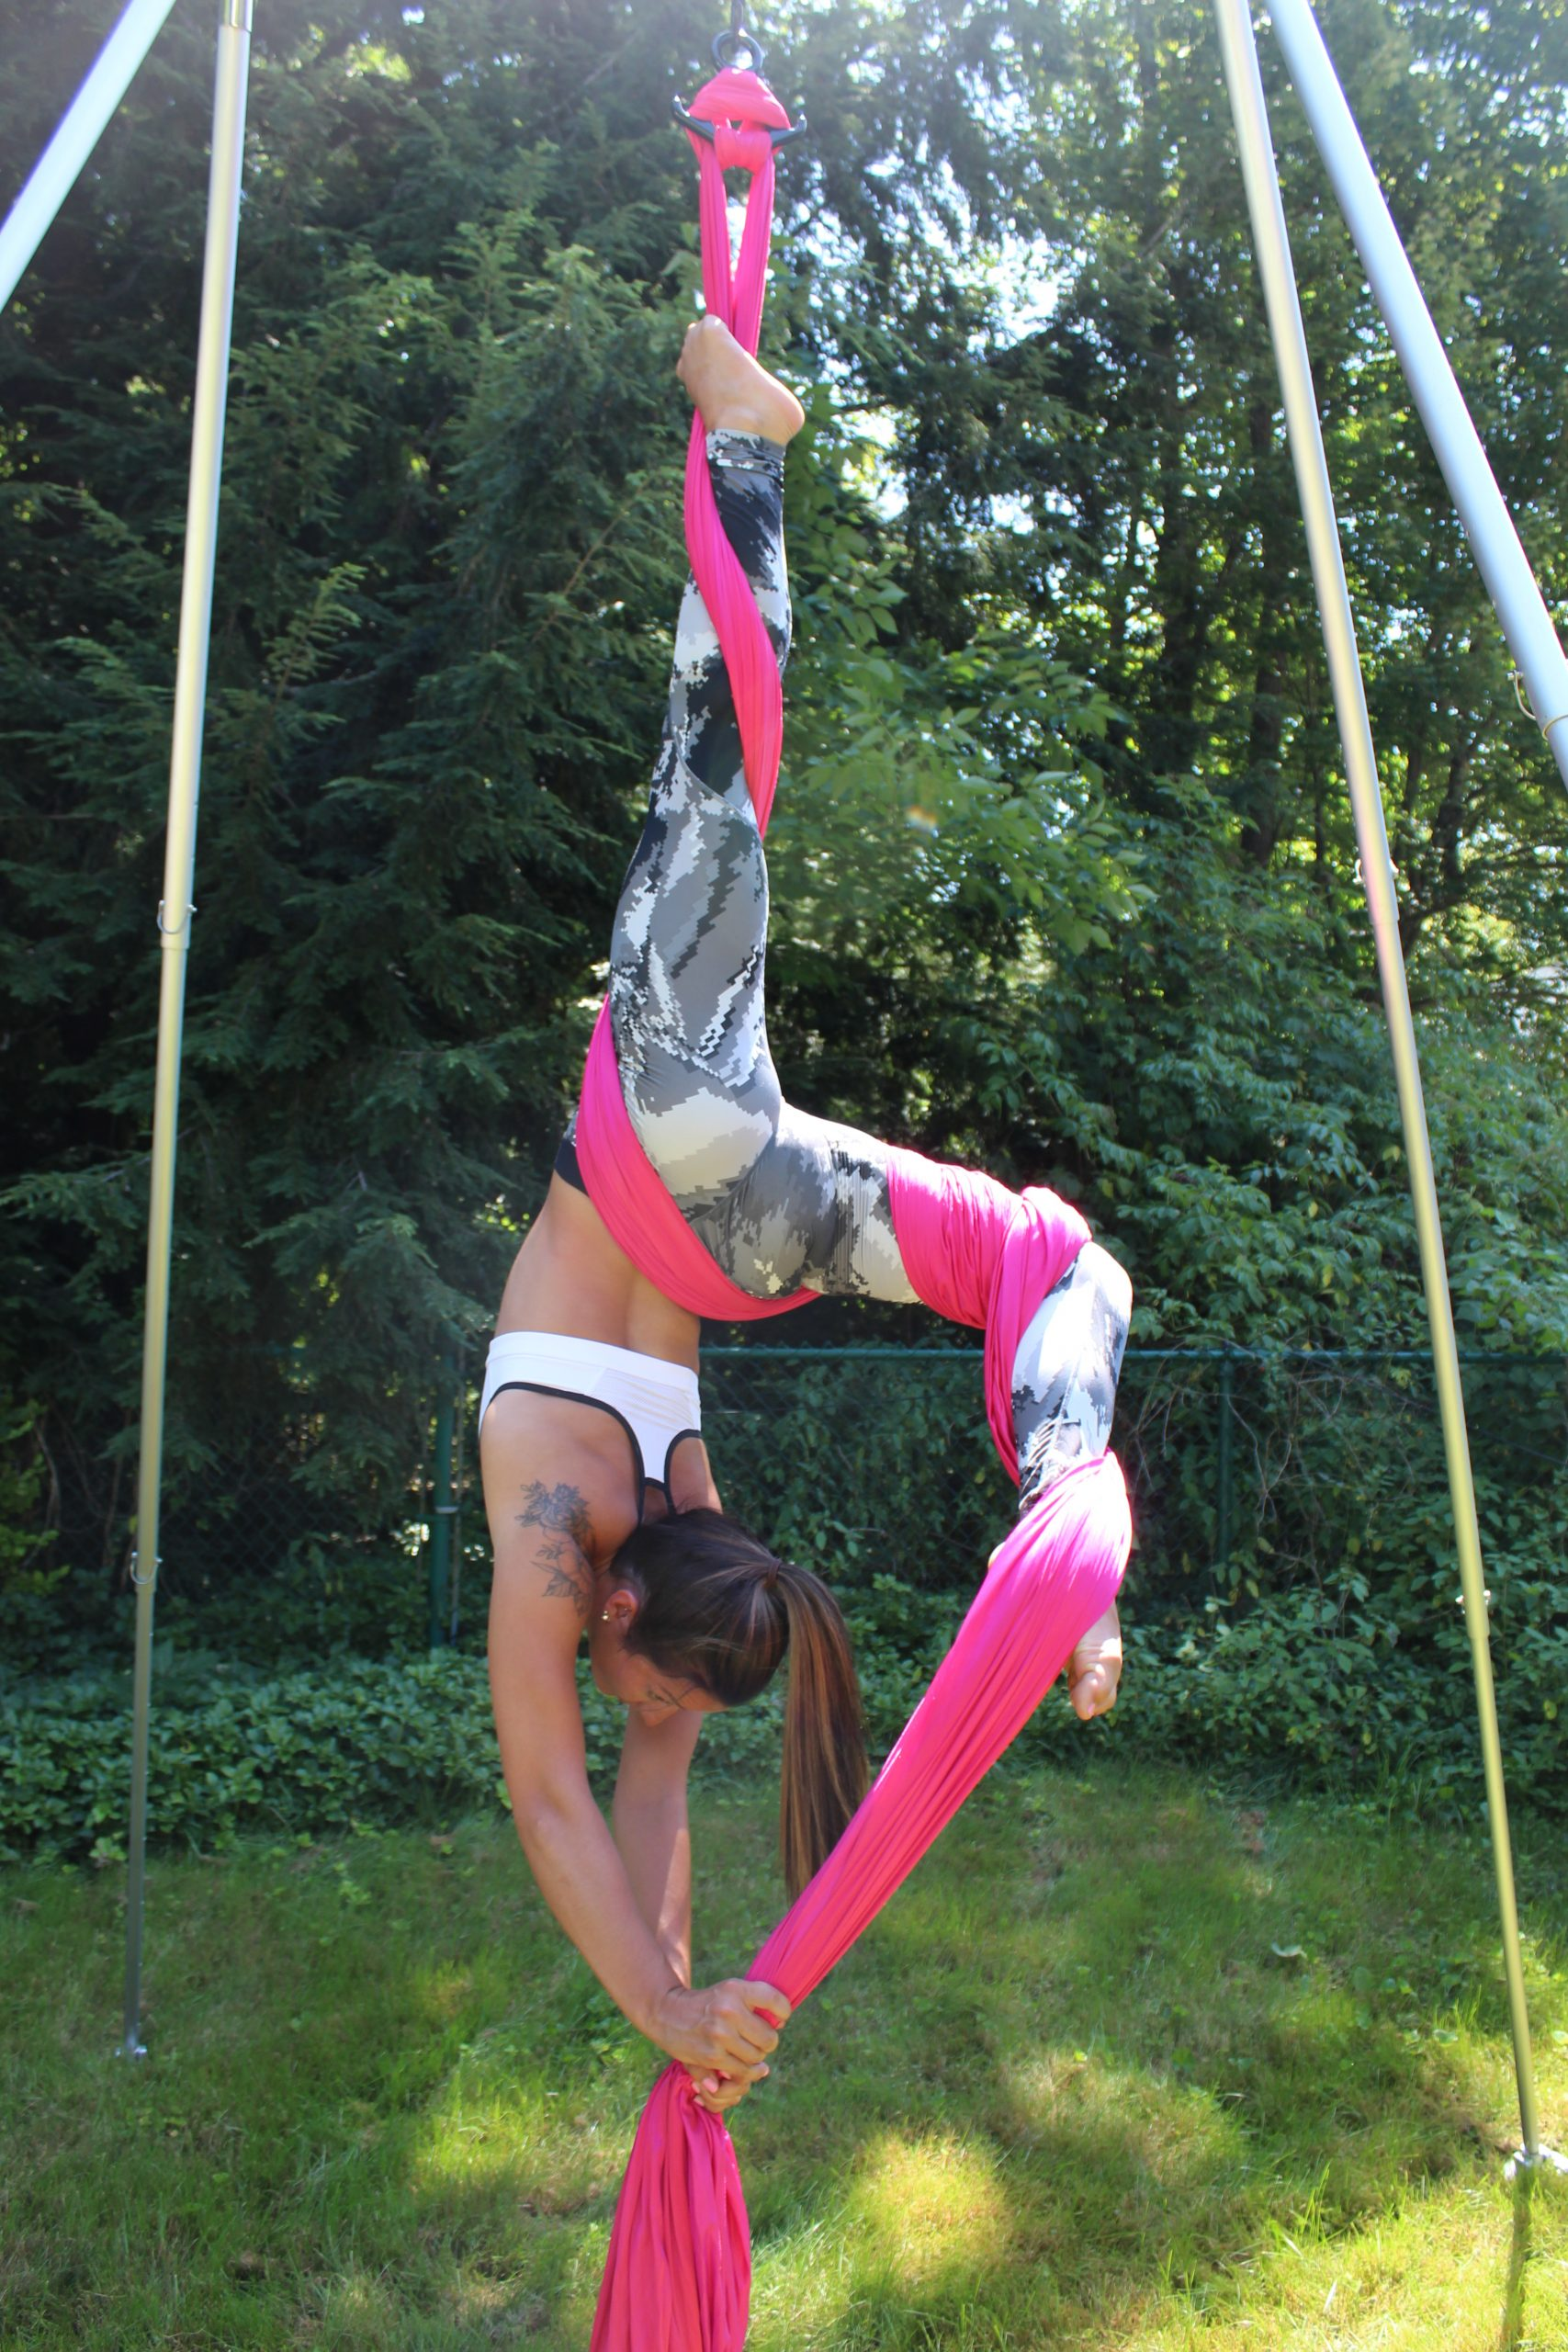 toni antonia schena aerial fitness silks kama fitness